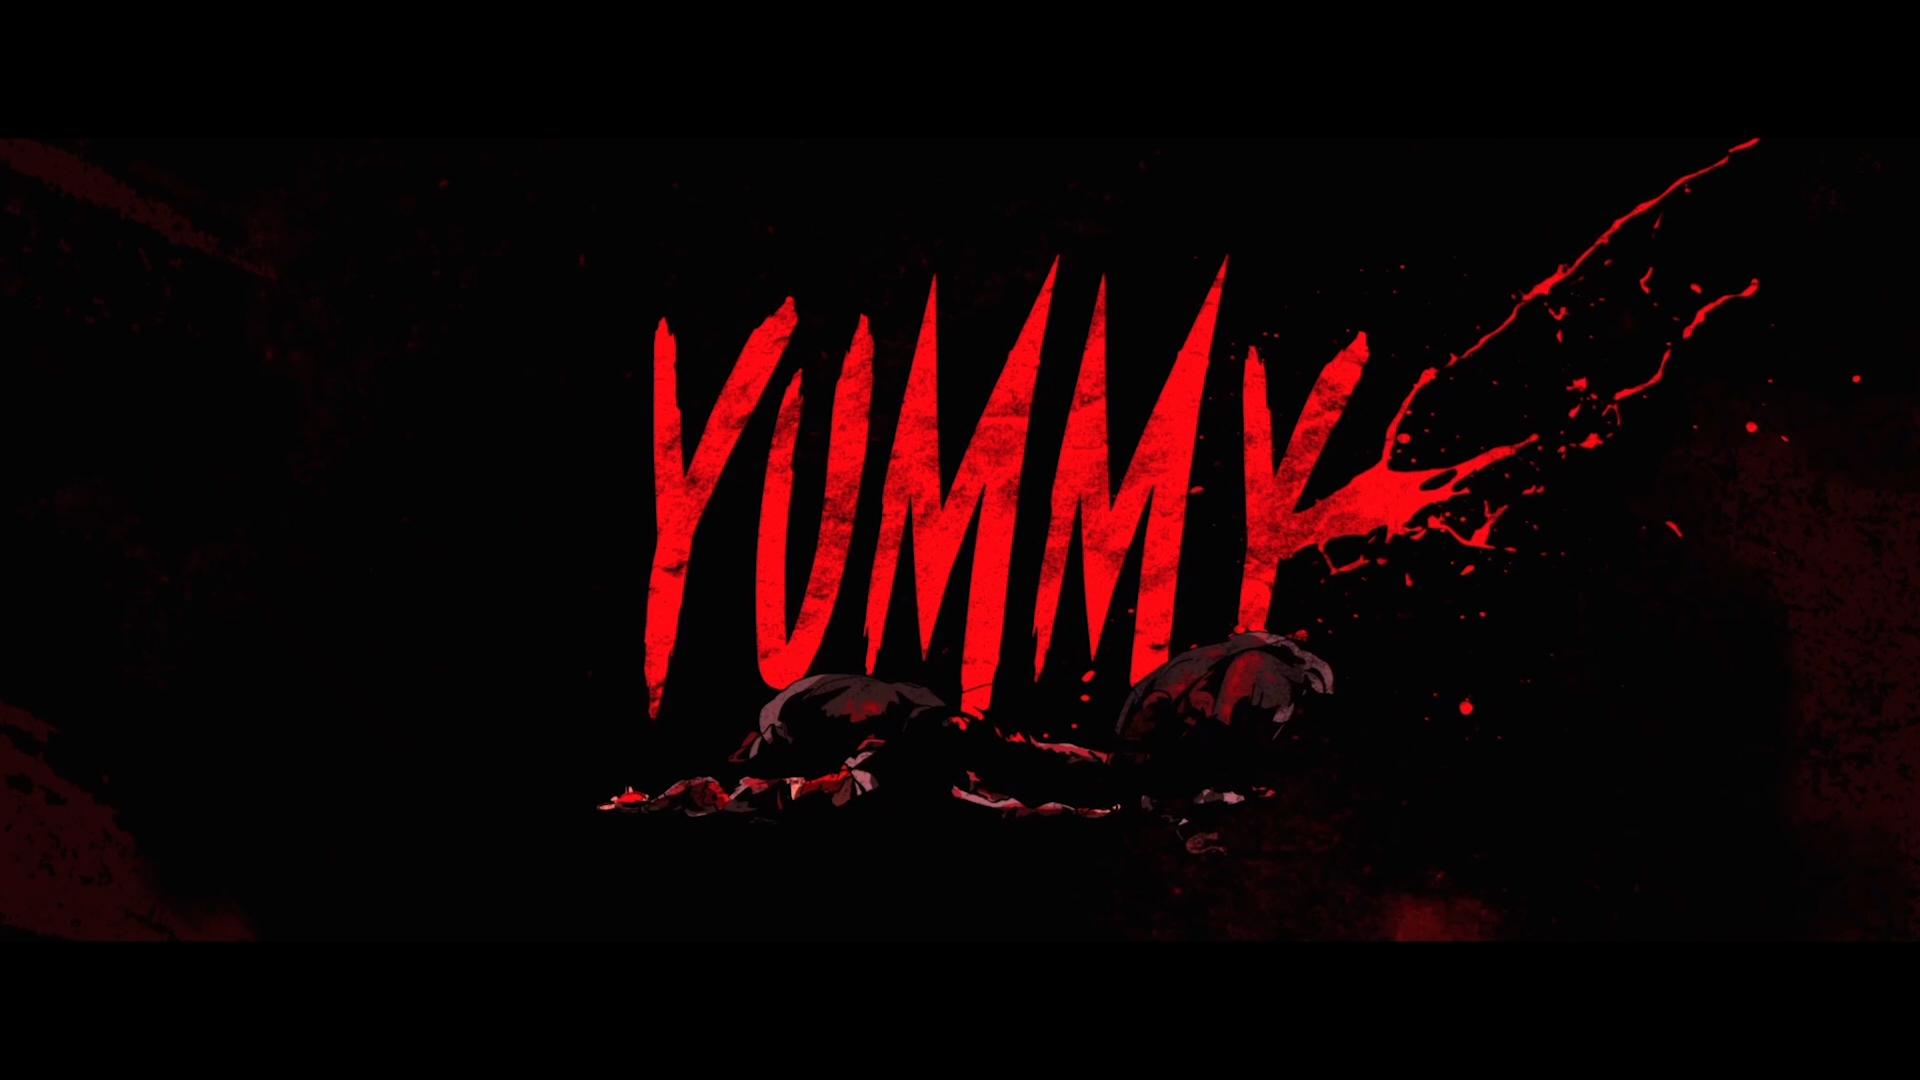 Clínica Zombie (2019) 1080p Remux Latino